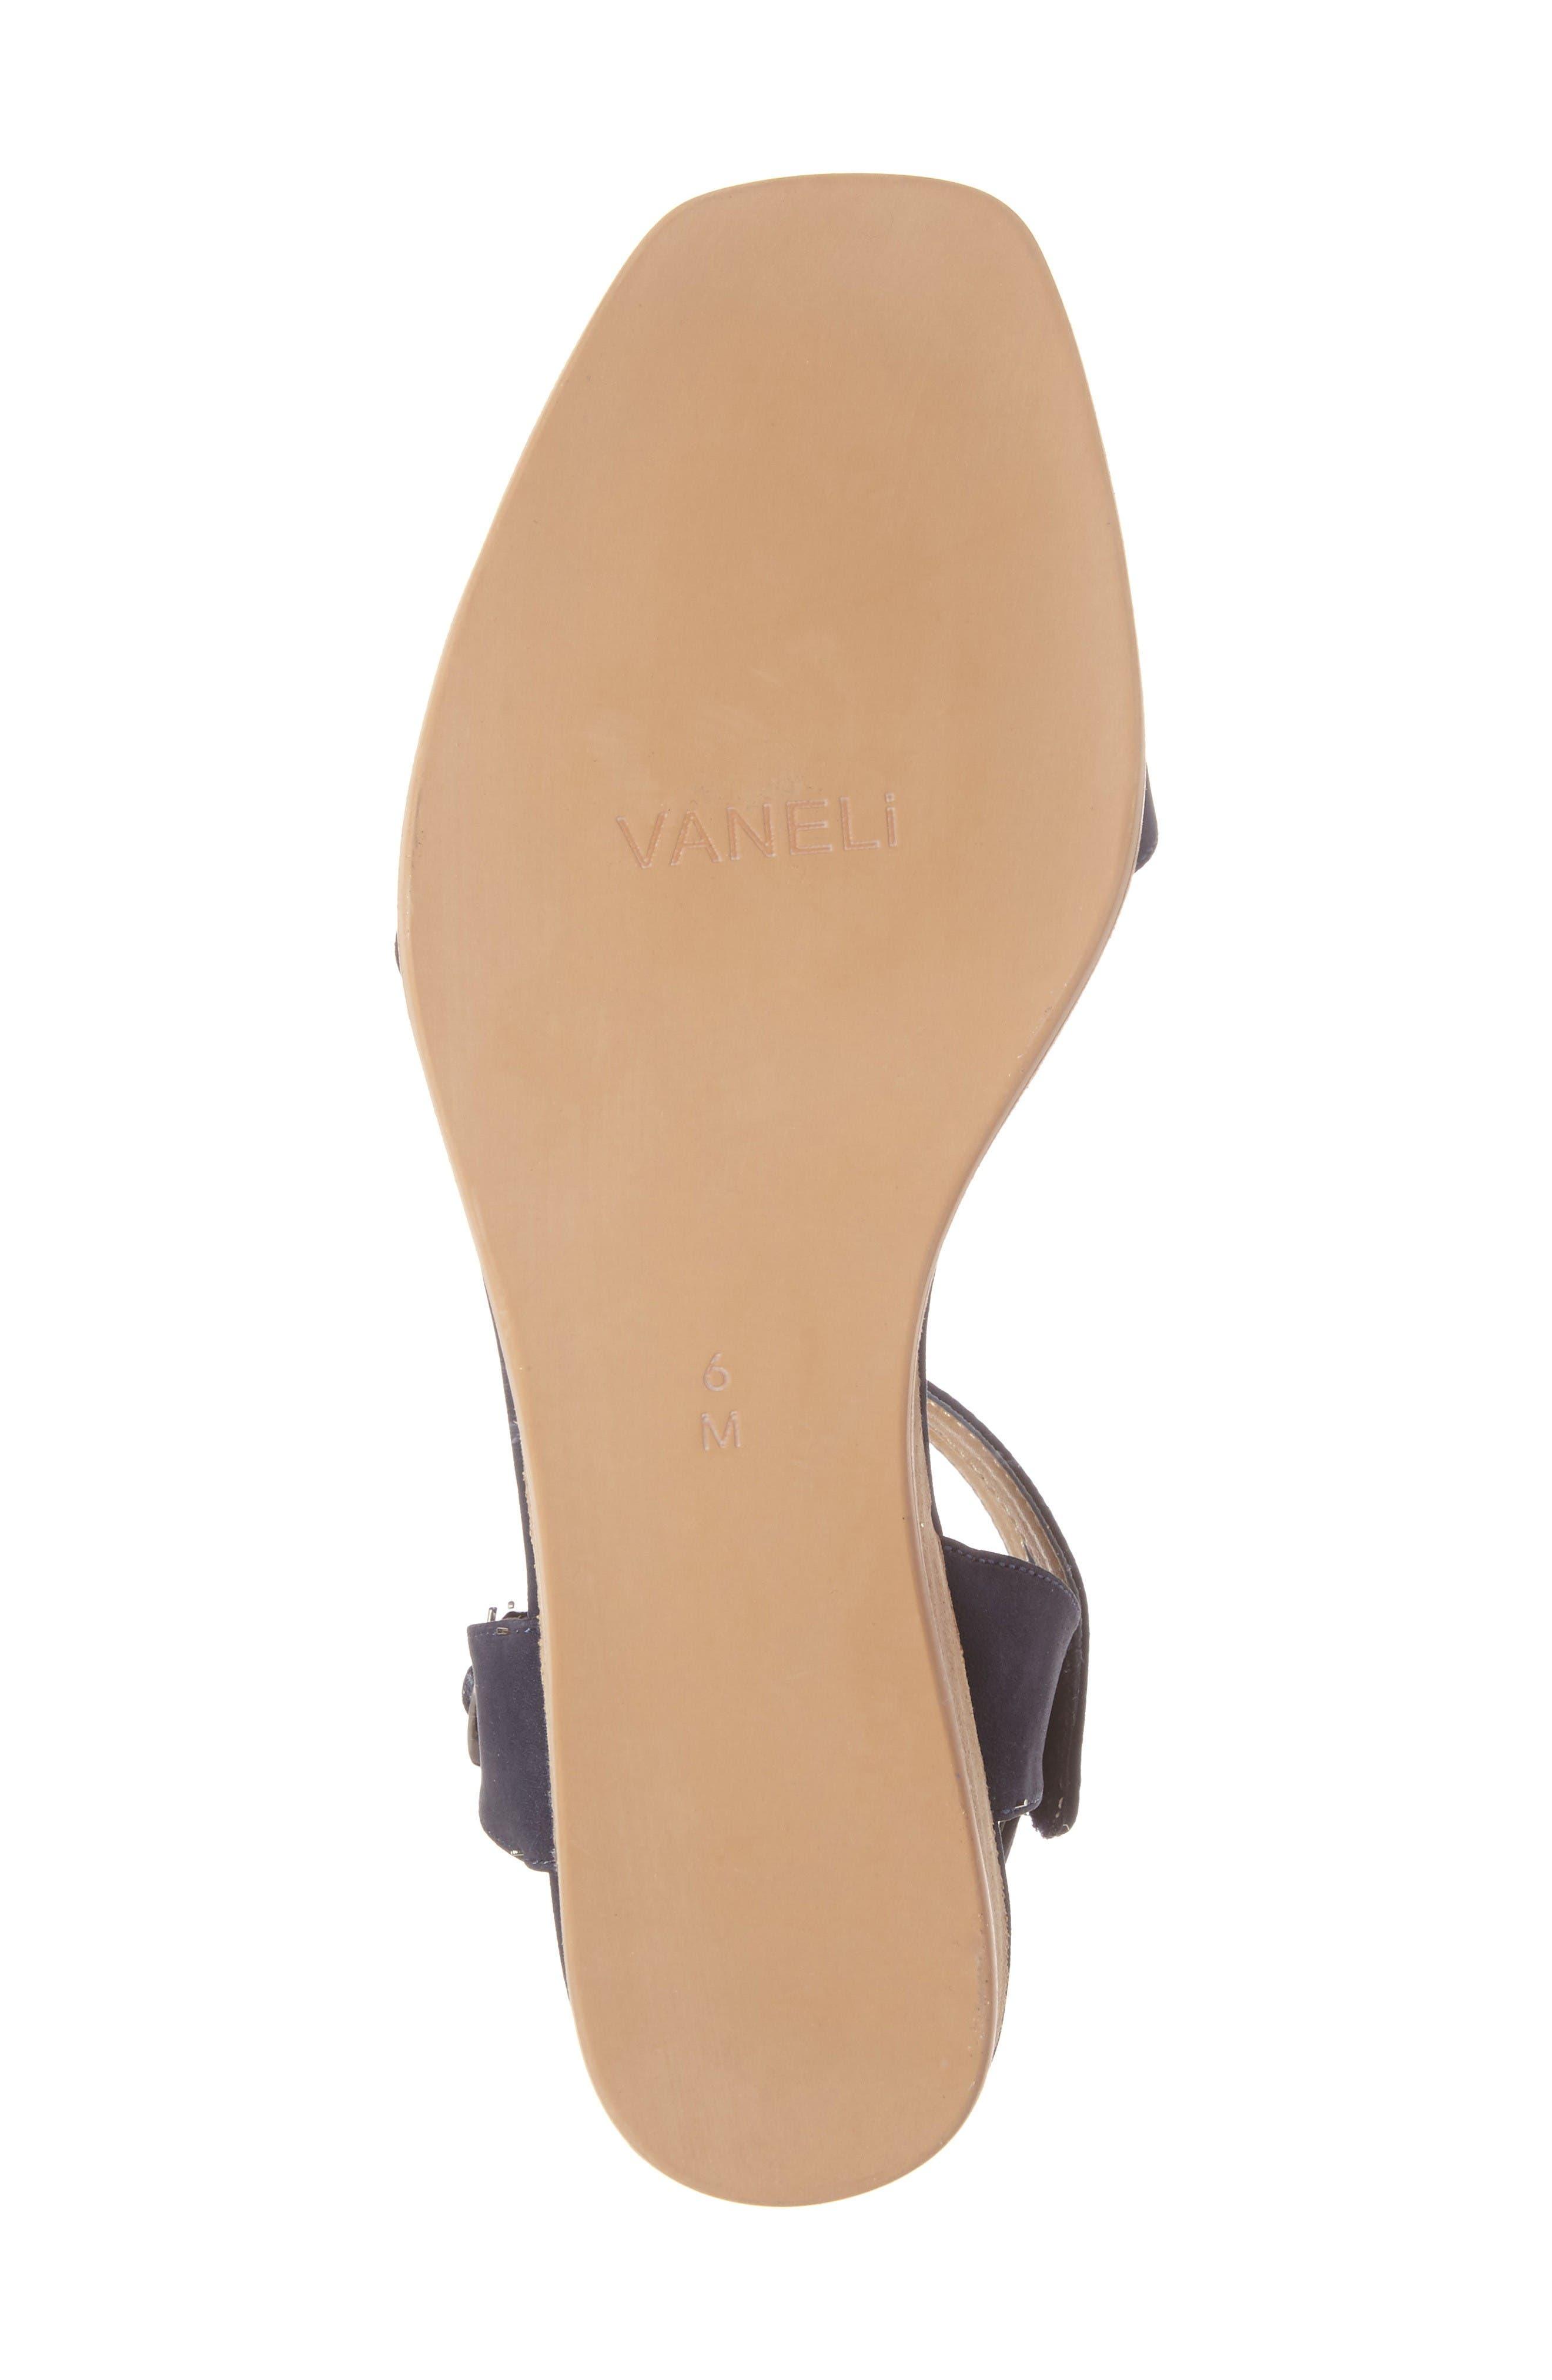 Jarita Ankle Strap Sandal,                             Alternate thumbnail 6, color,                             Navy Leather